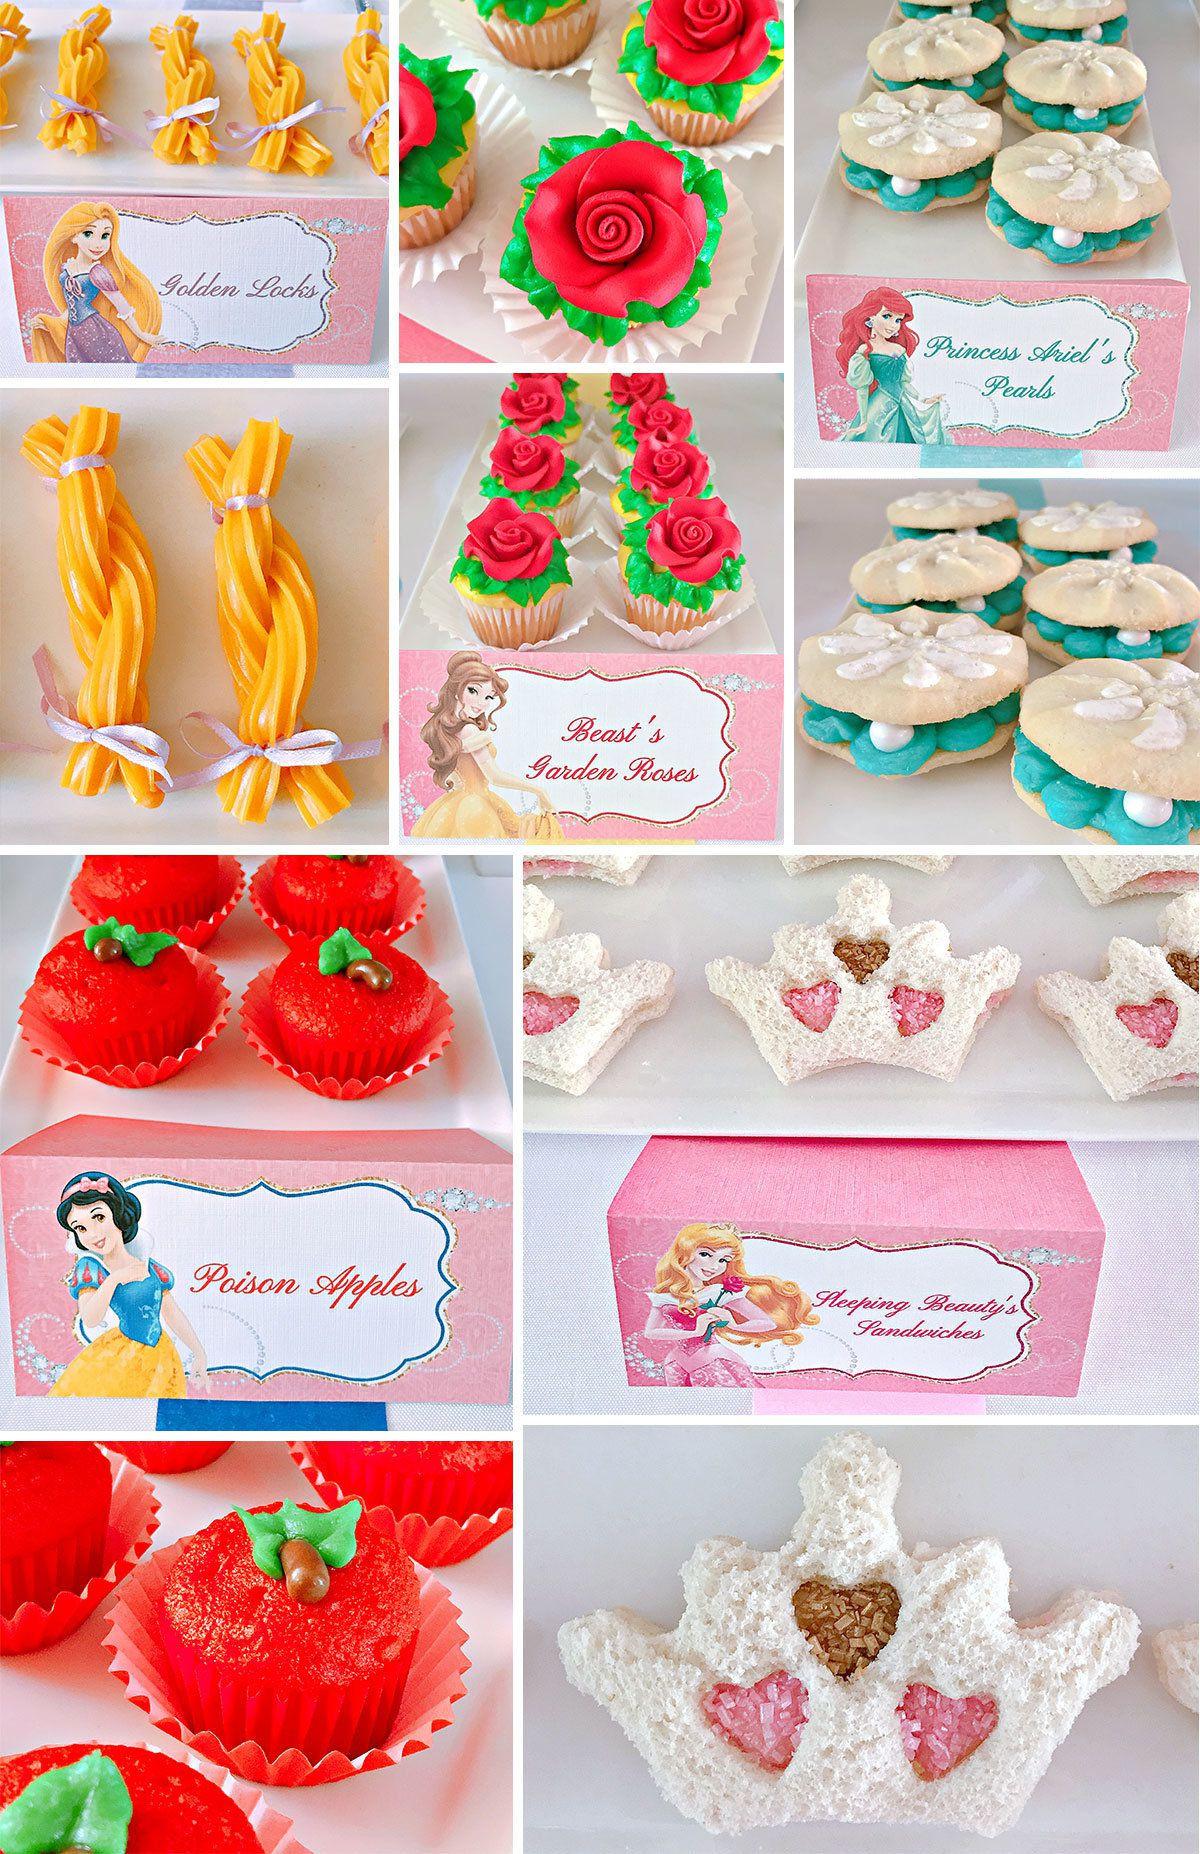 Disney Princess Party Food Ideas  Disney Princess Party Ideas